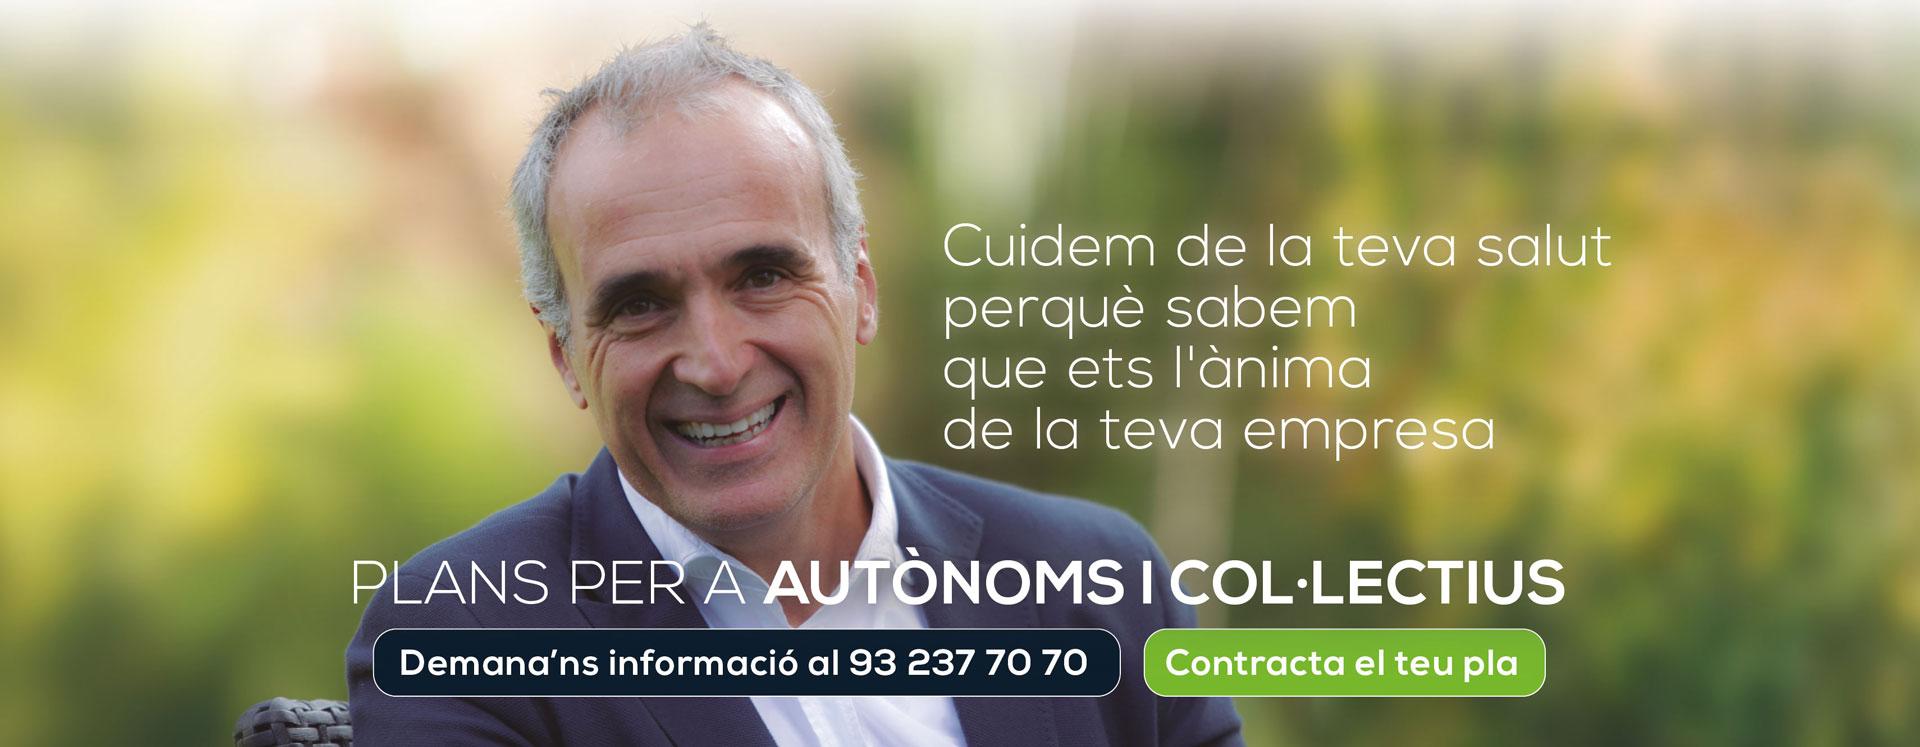 assegurances-per-autonoms-i-col-lectius